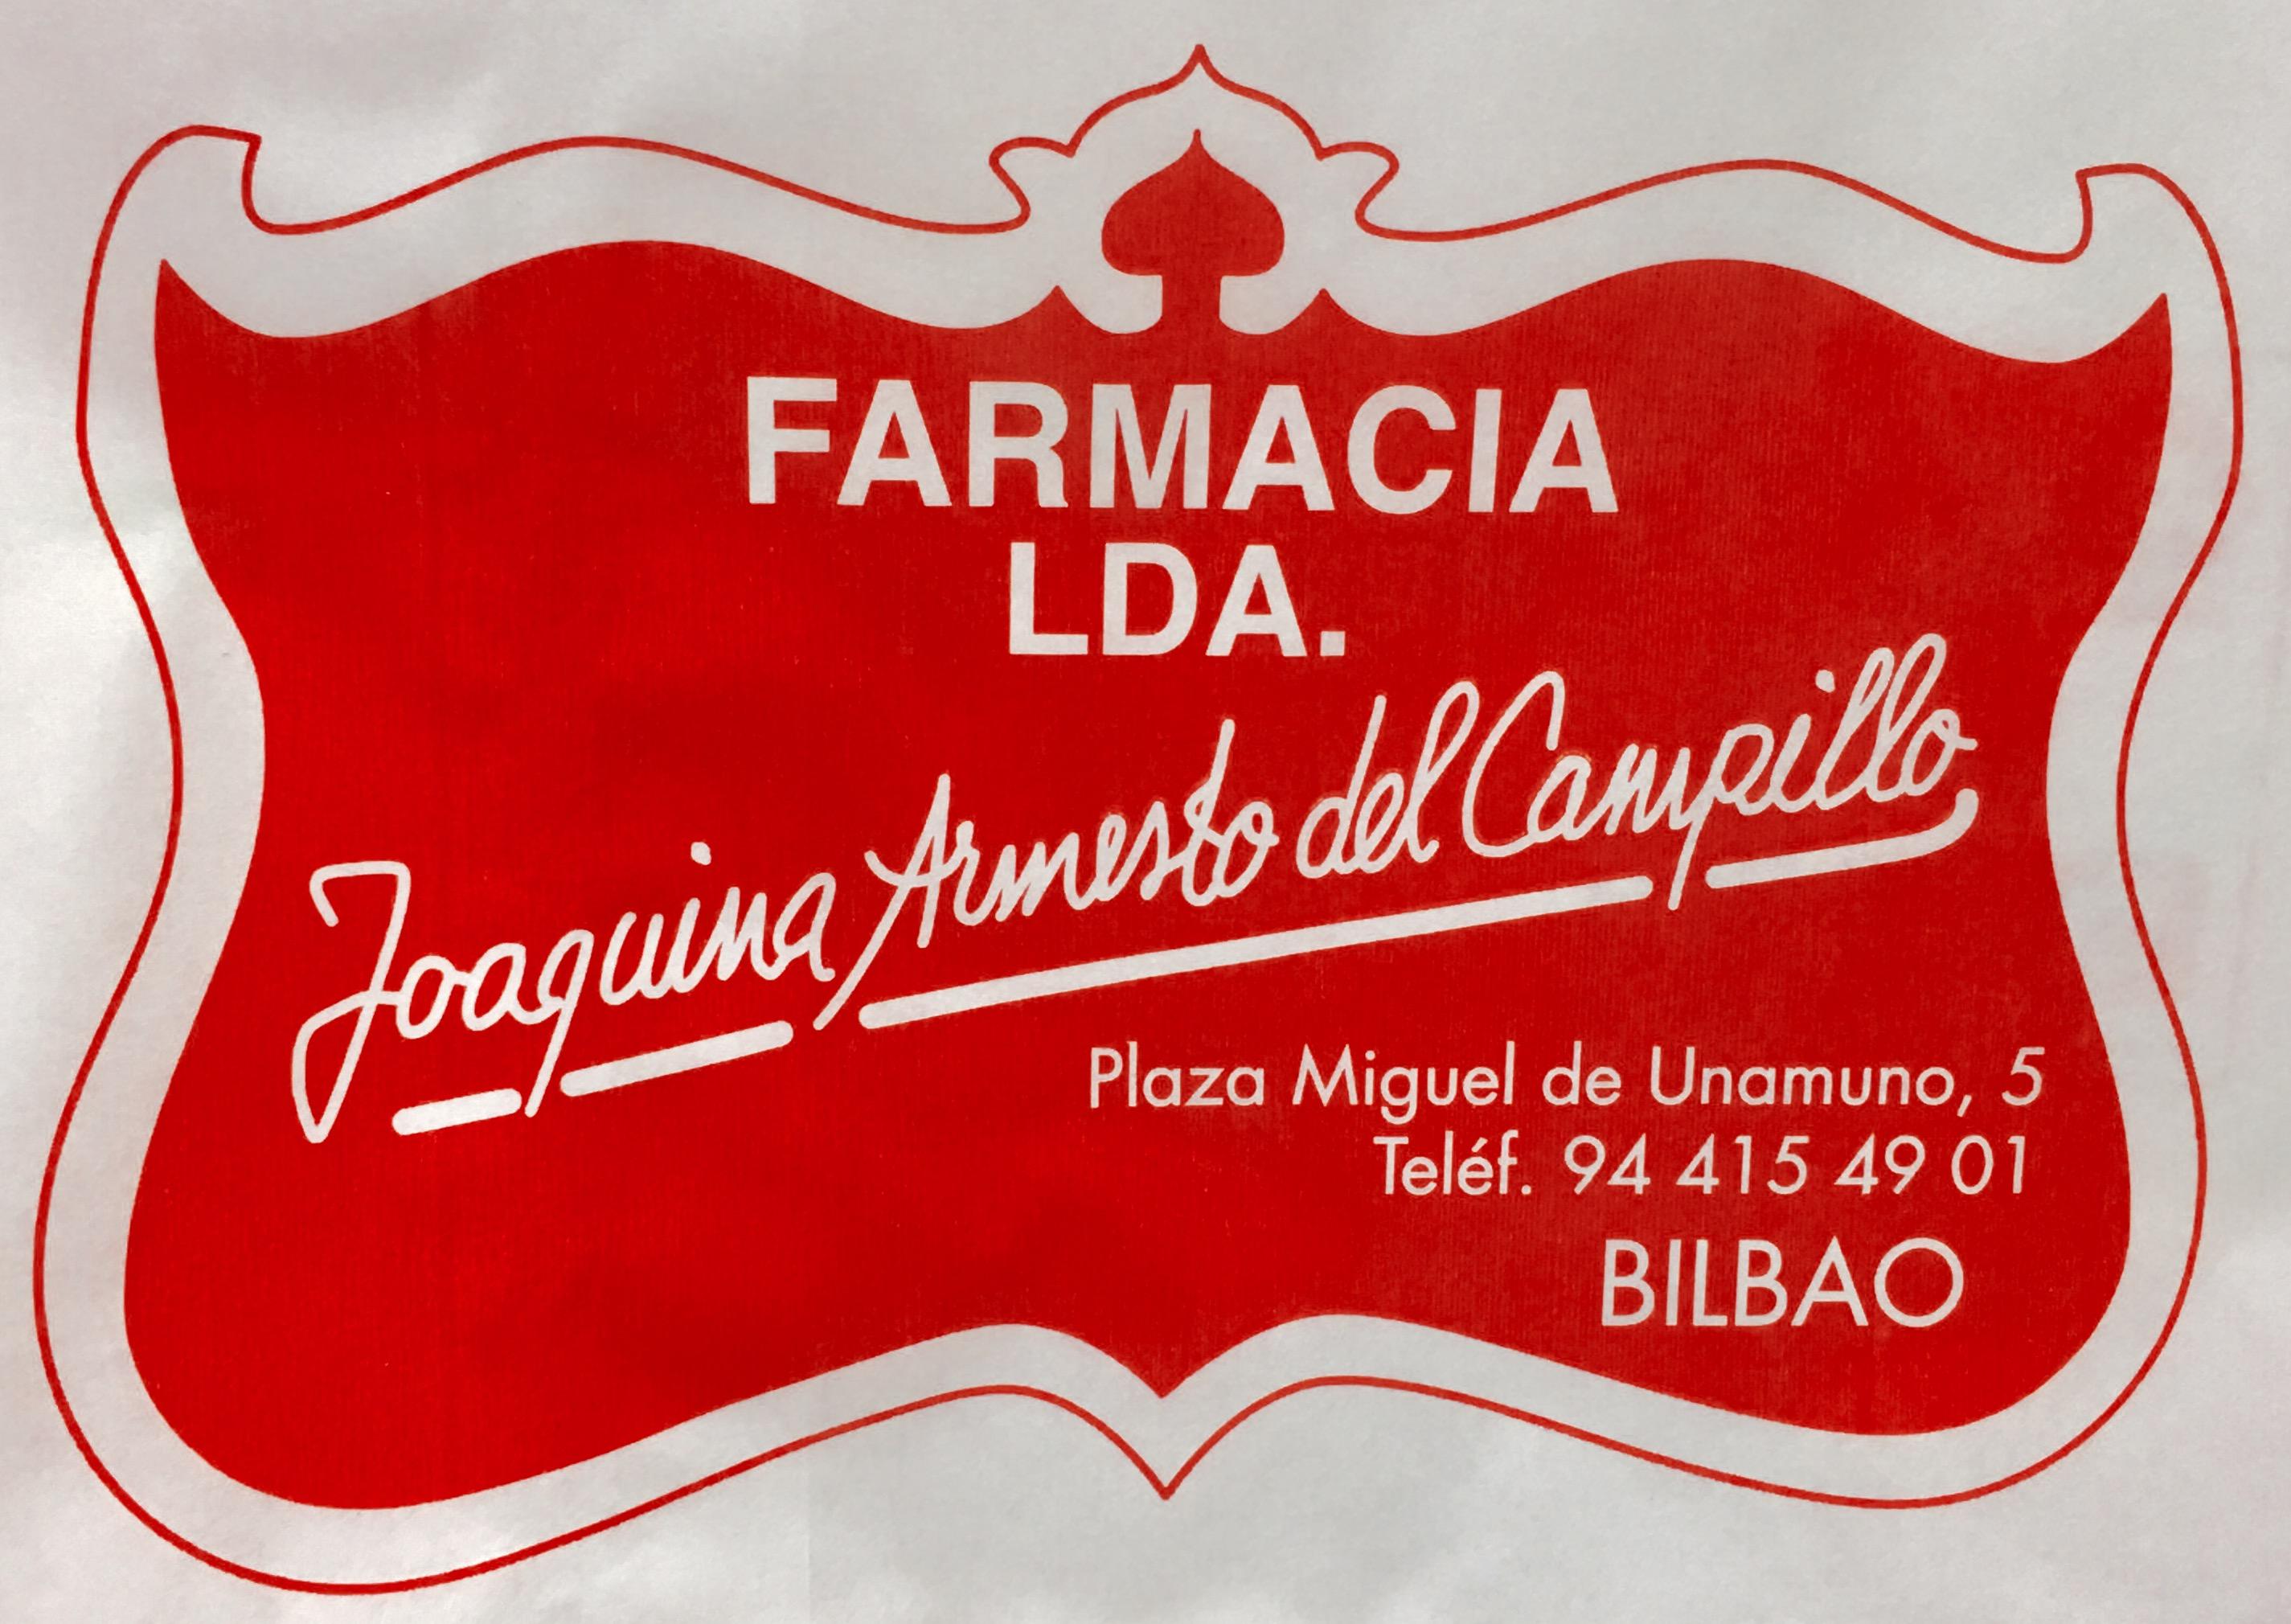 Farmacia Lda. Joaquina Armesto